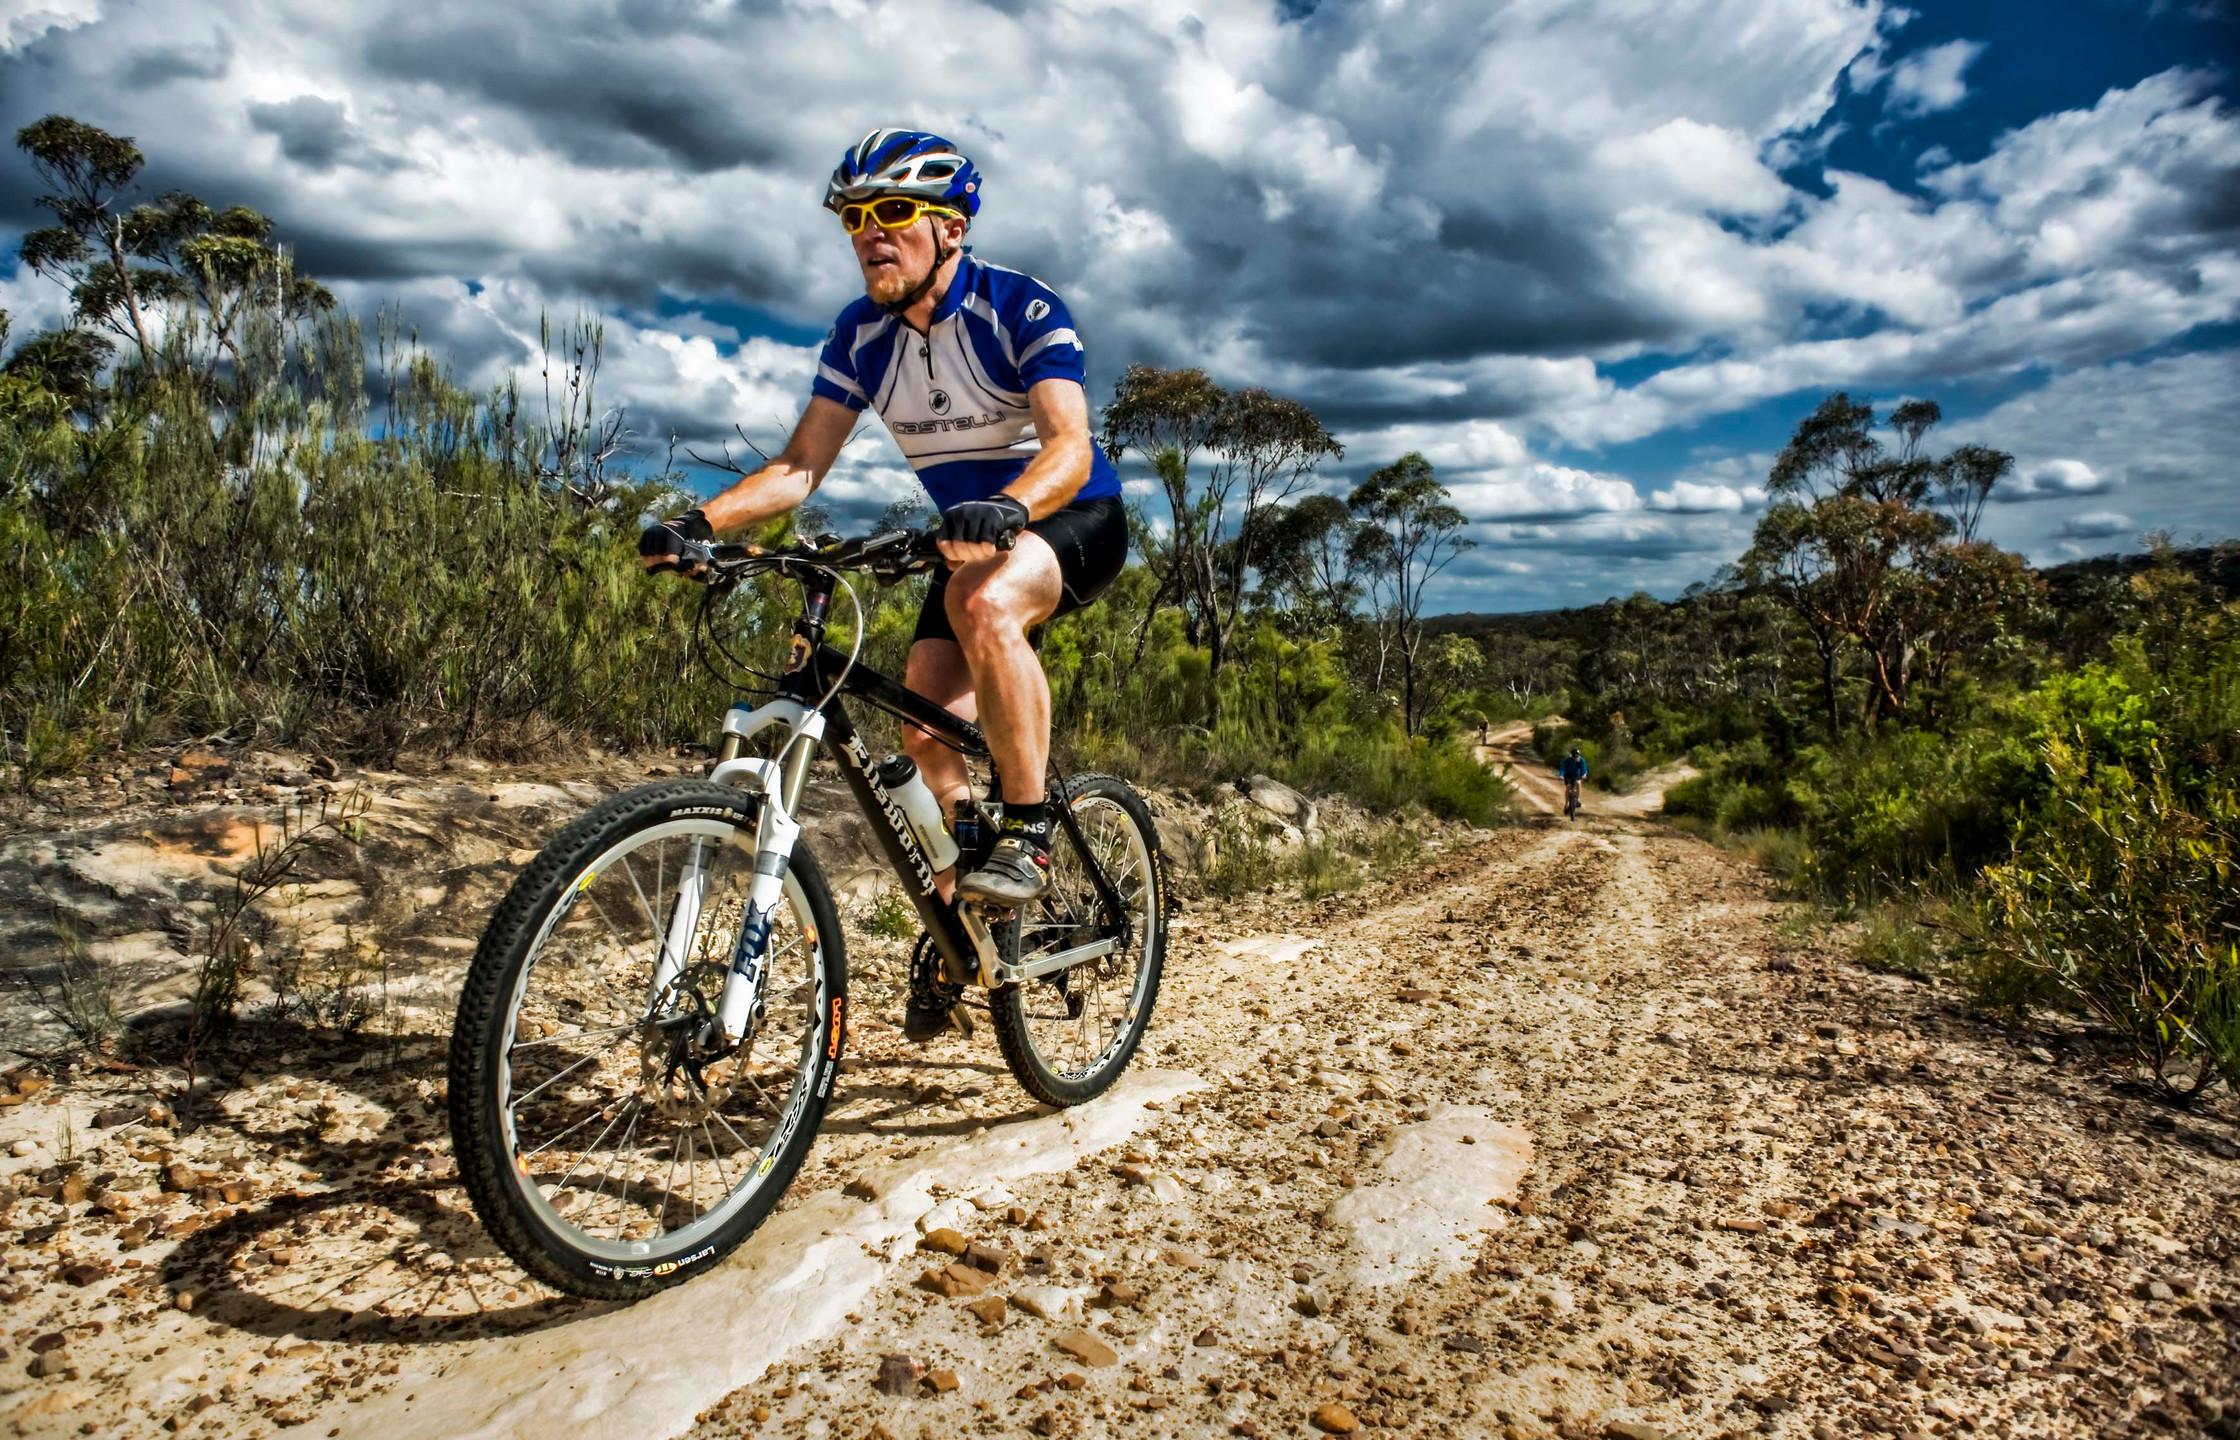 Mountain biking along the Oaks track between Glenbrook and Woodford